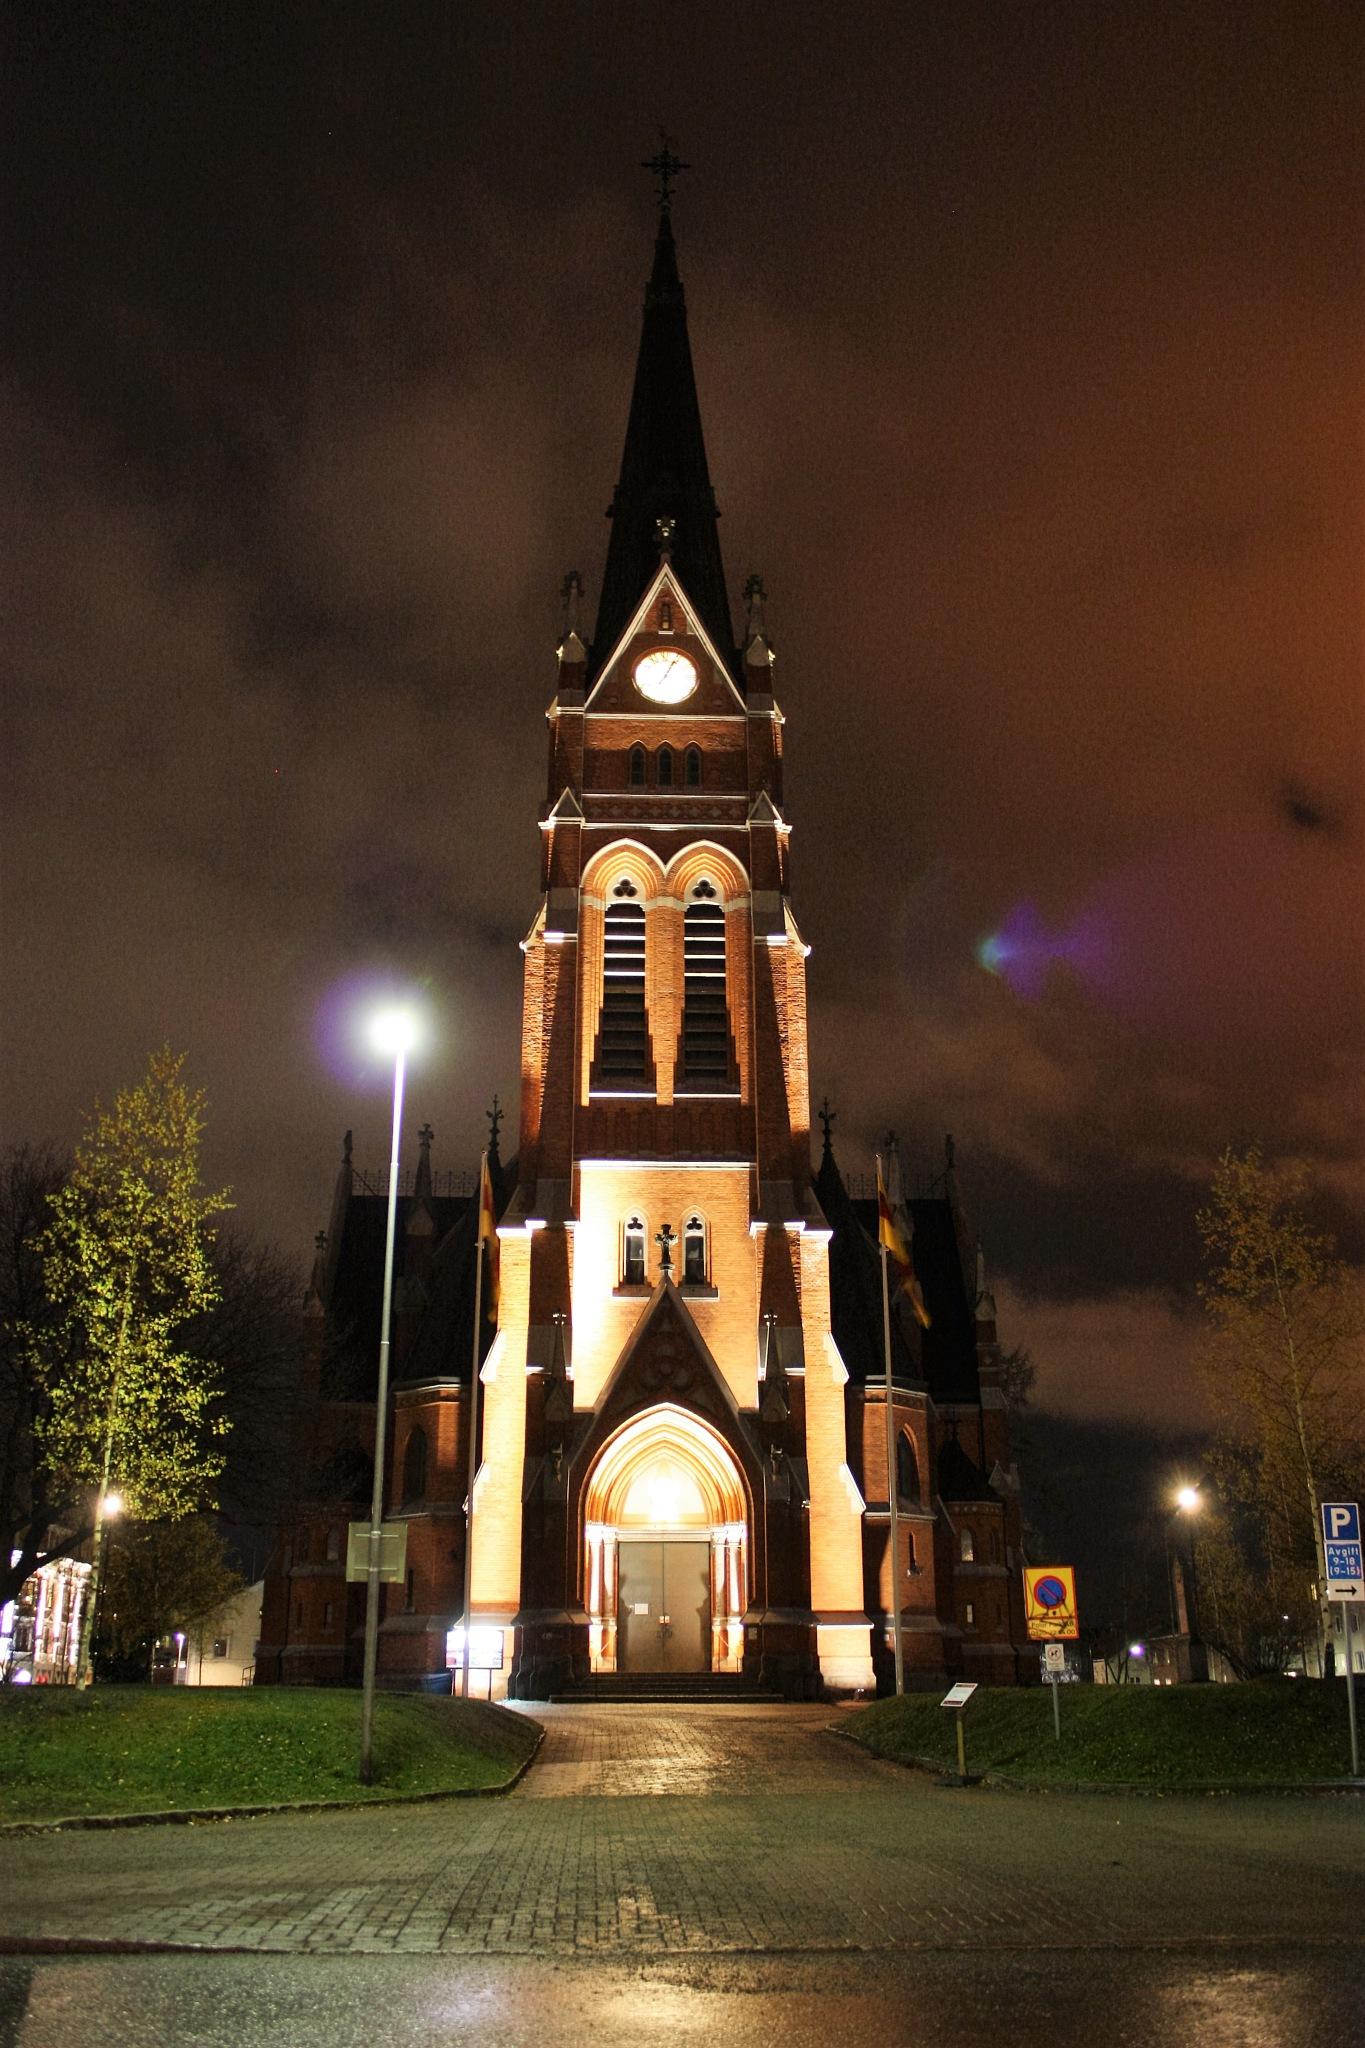 Luleå cathedral by karinbelinki